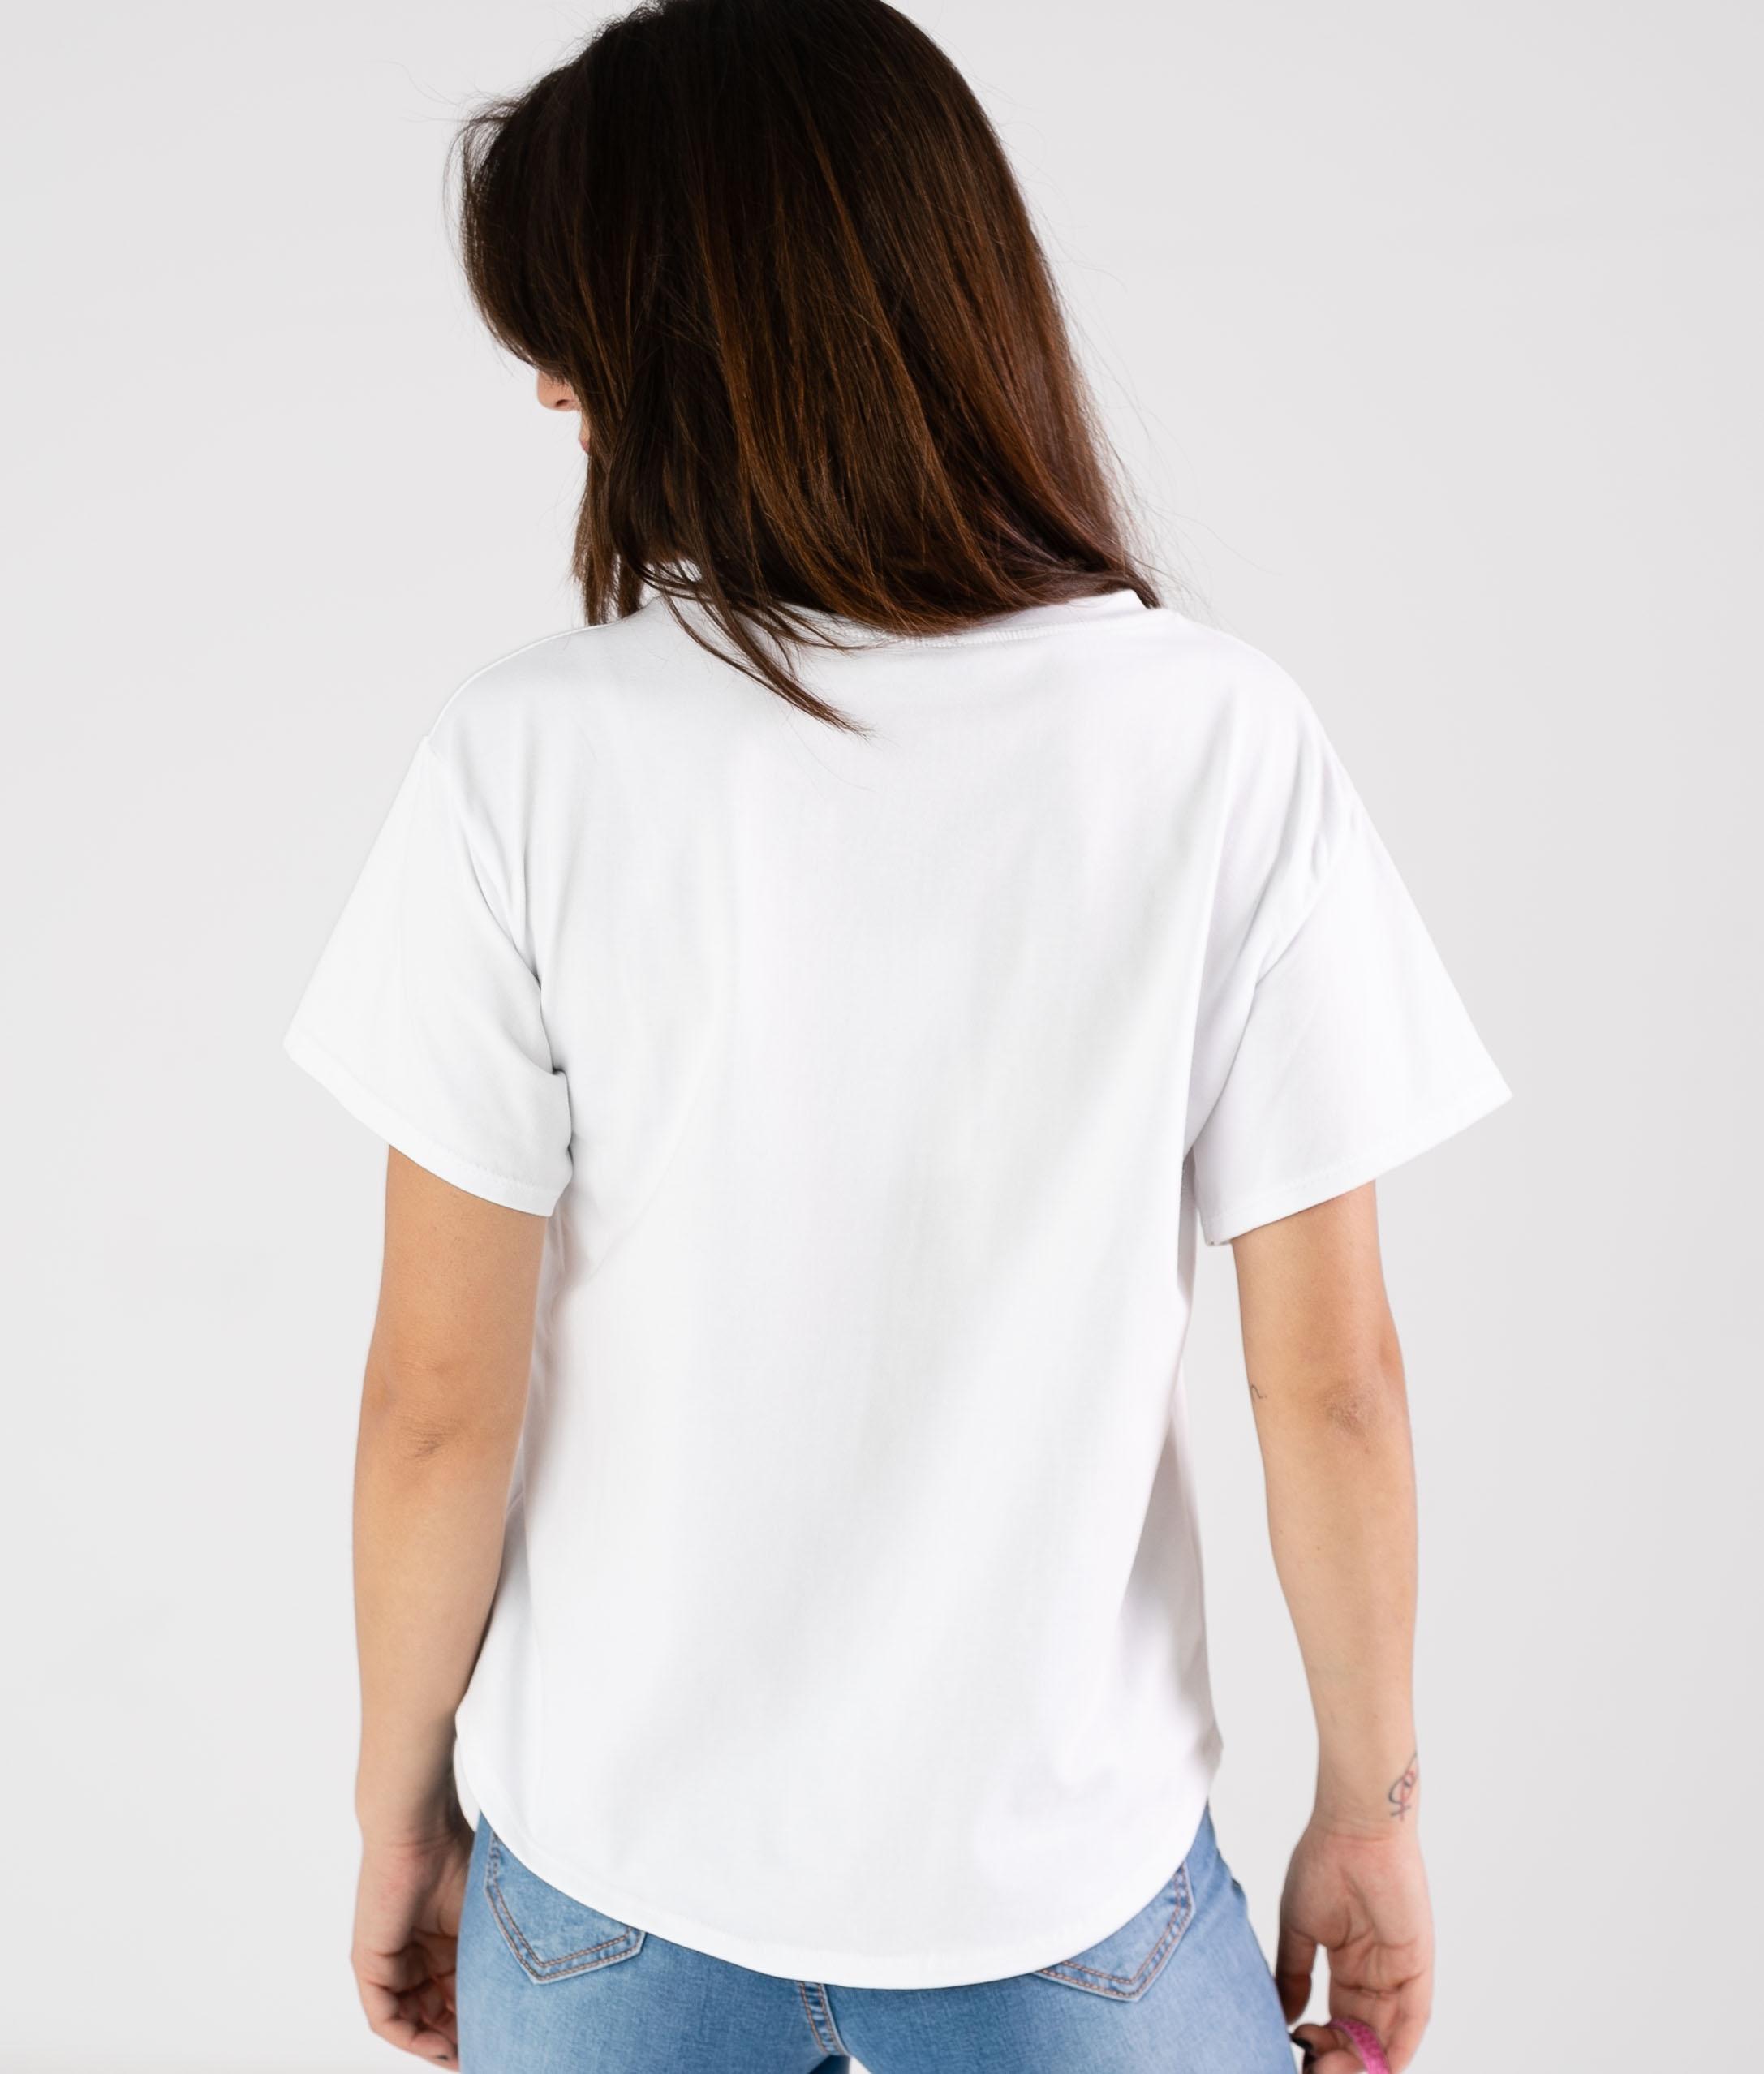 Camiseta Corile - Azul